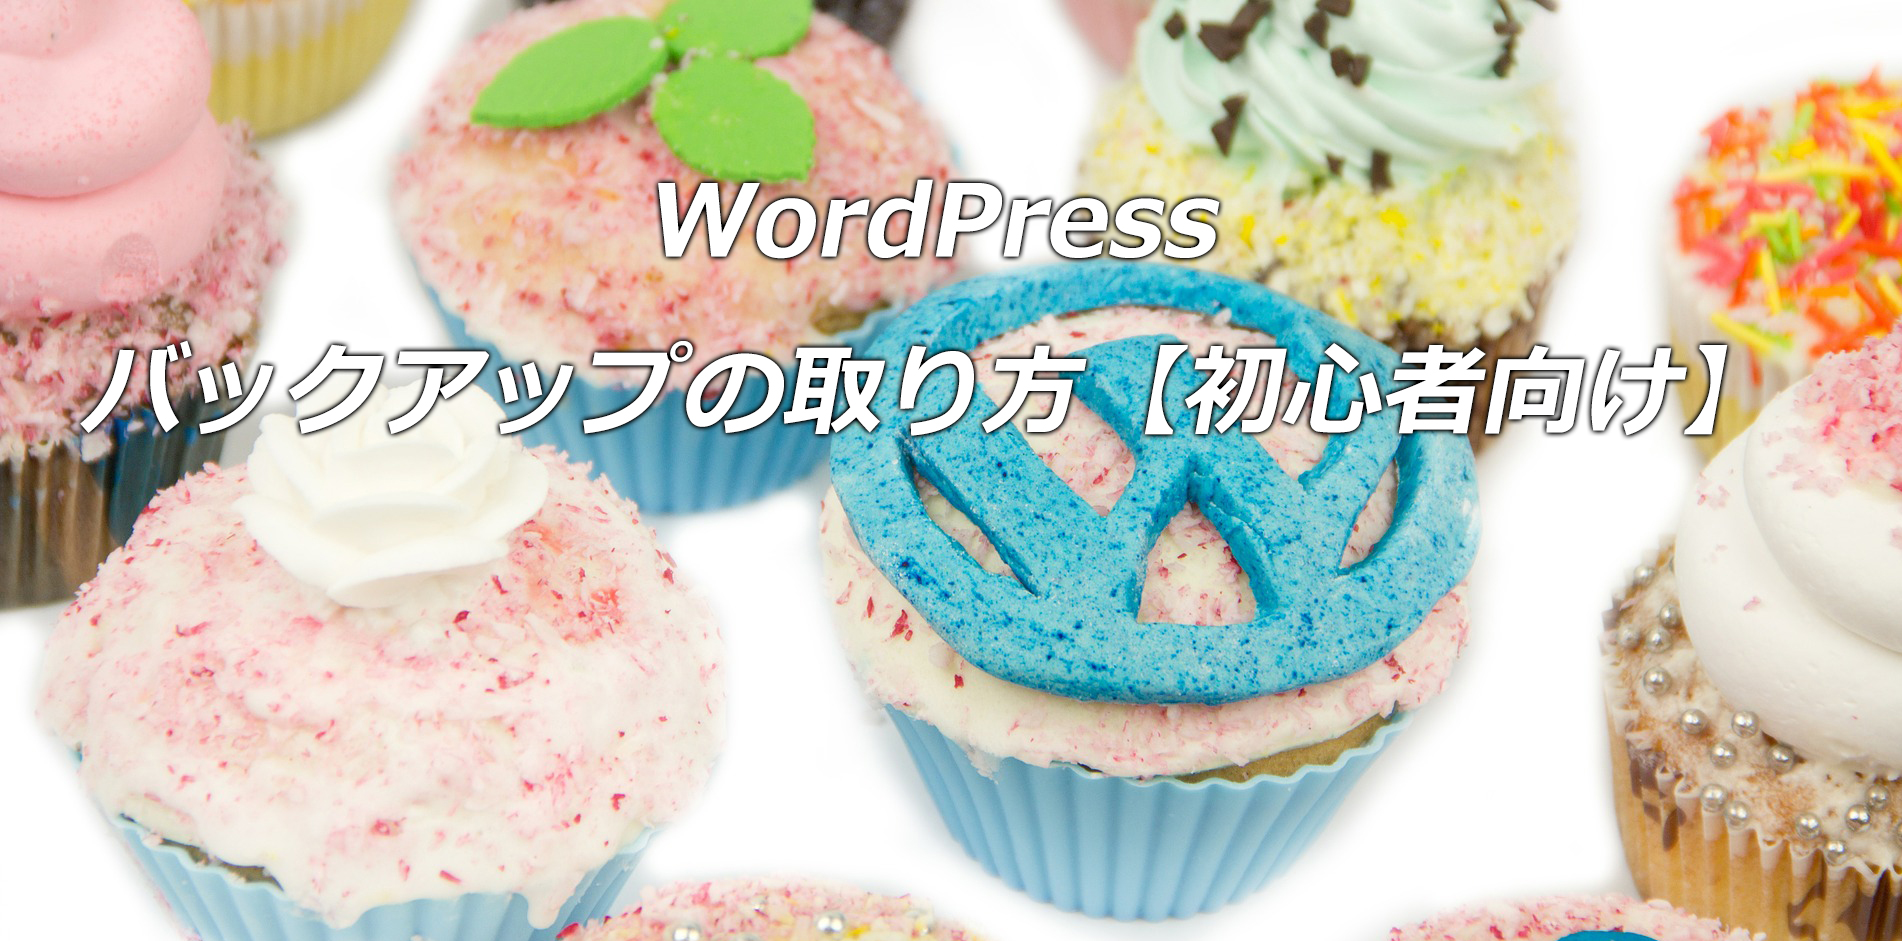 WordPressバックアップの取り方【初心者向け】